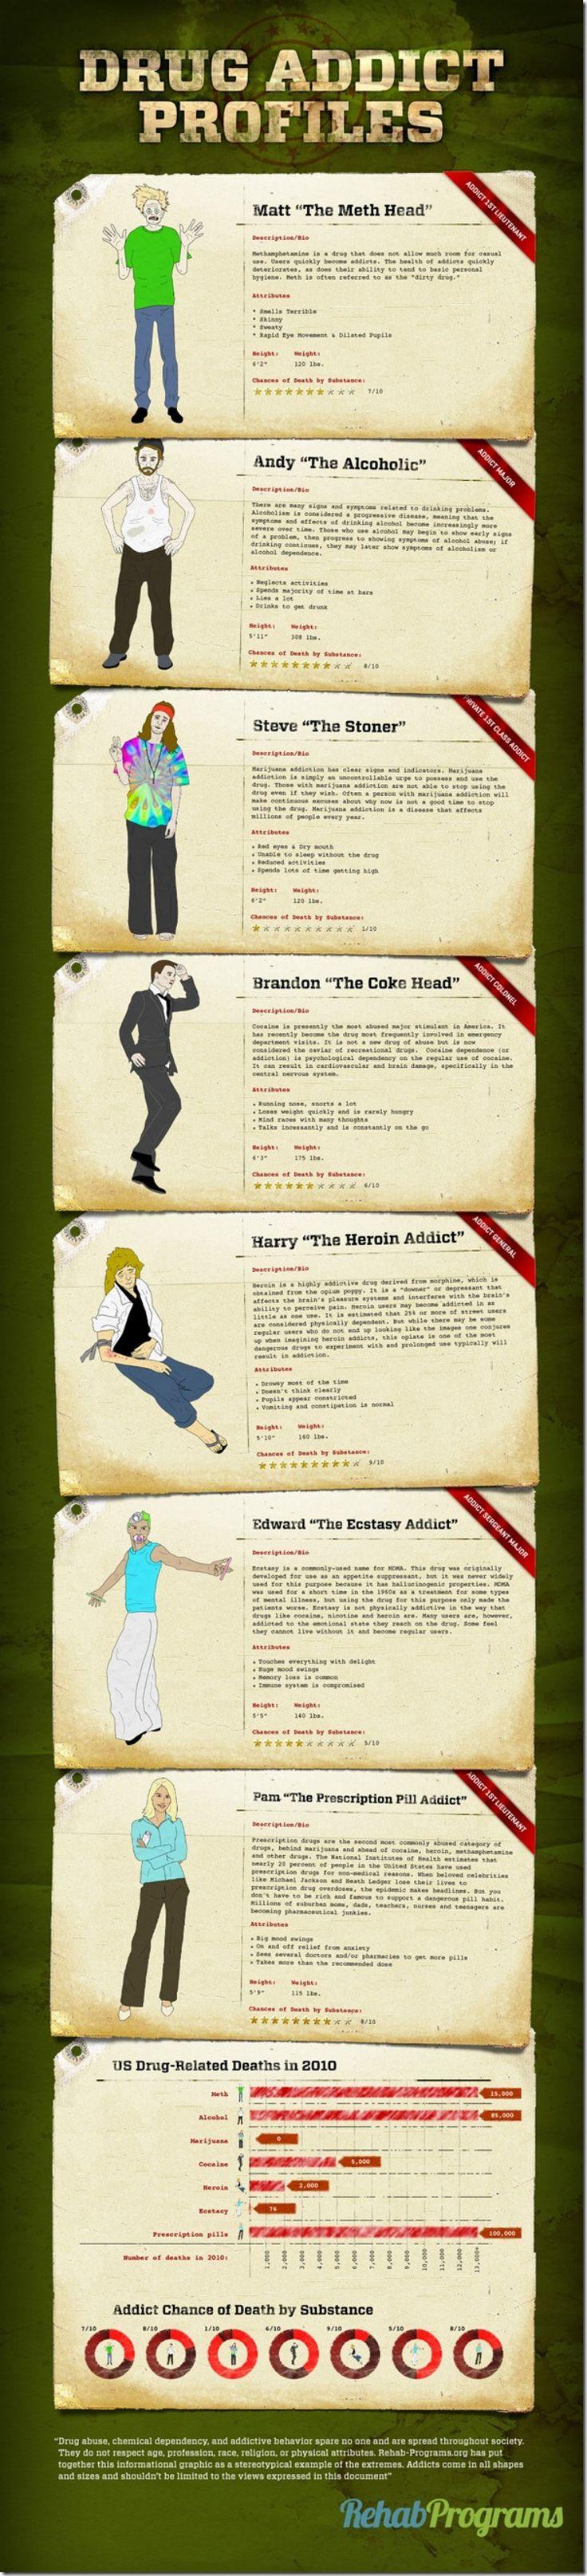 Drug Addict Profiles Infographic